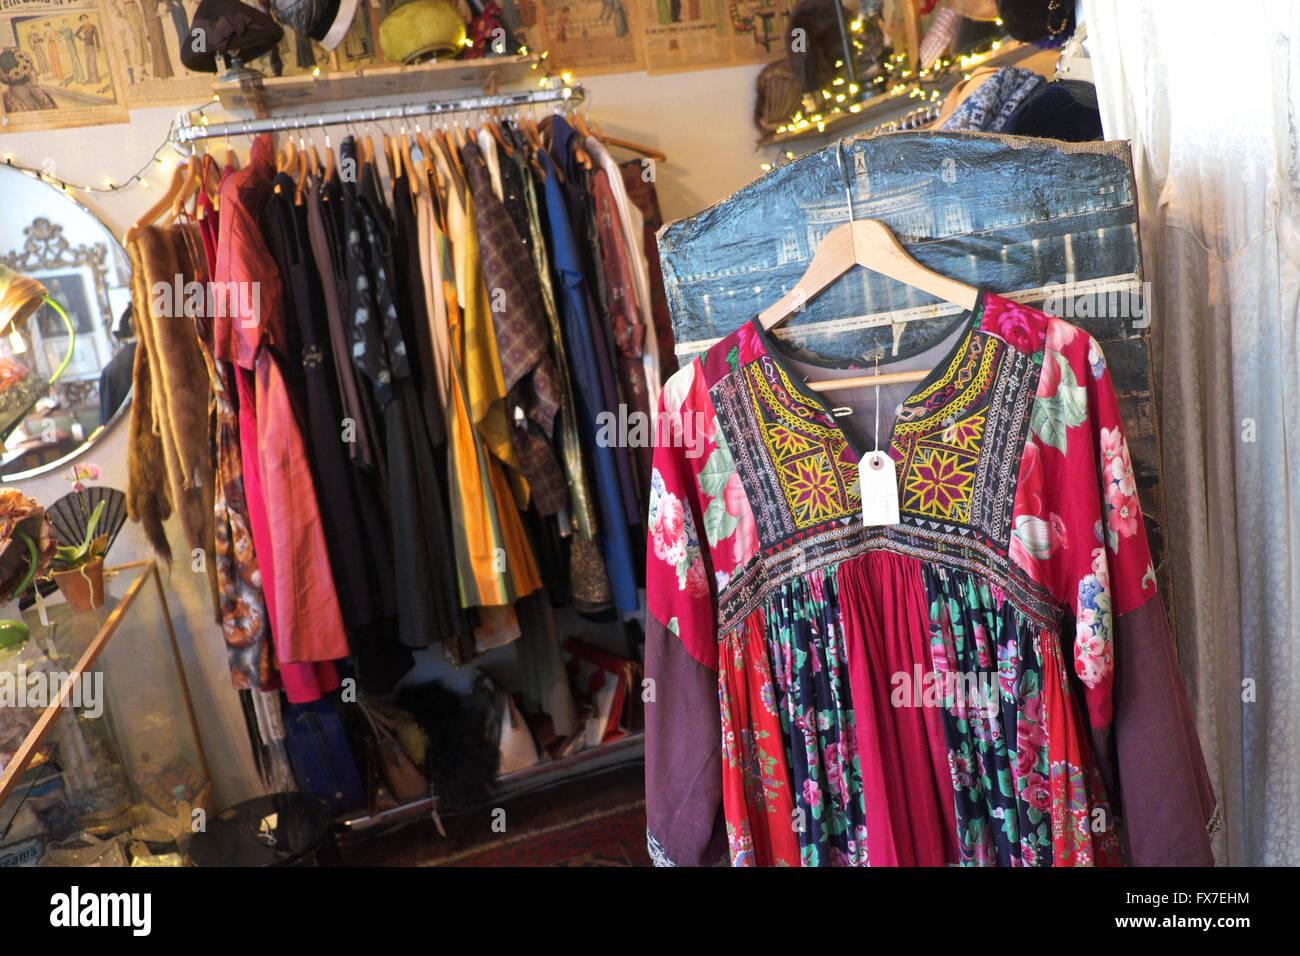 Afghan Clothing Stockfotos & Afghan Clothing Bilder - Alamy